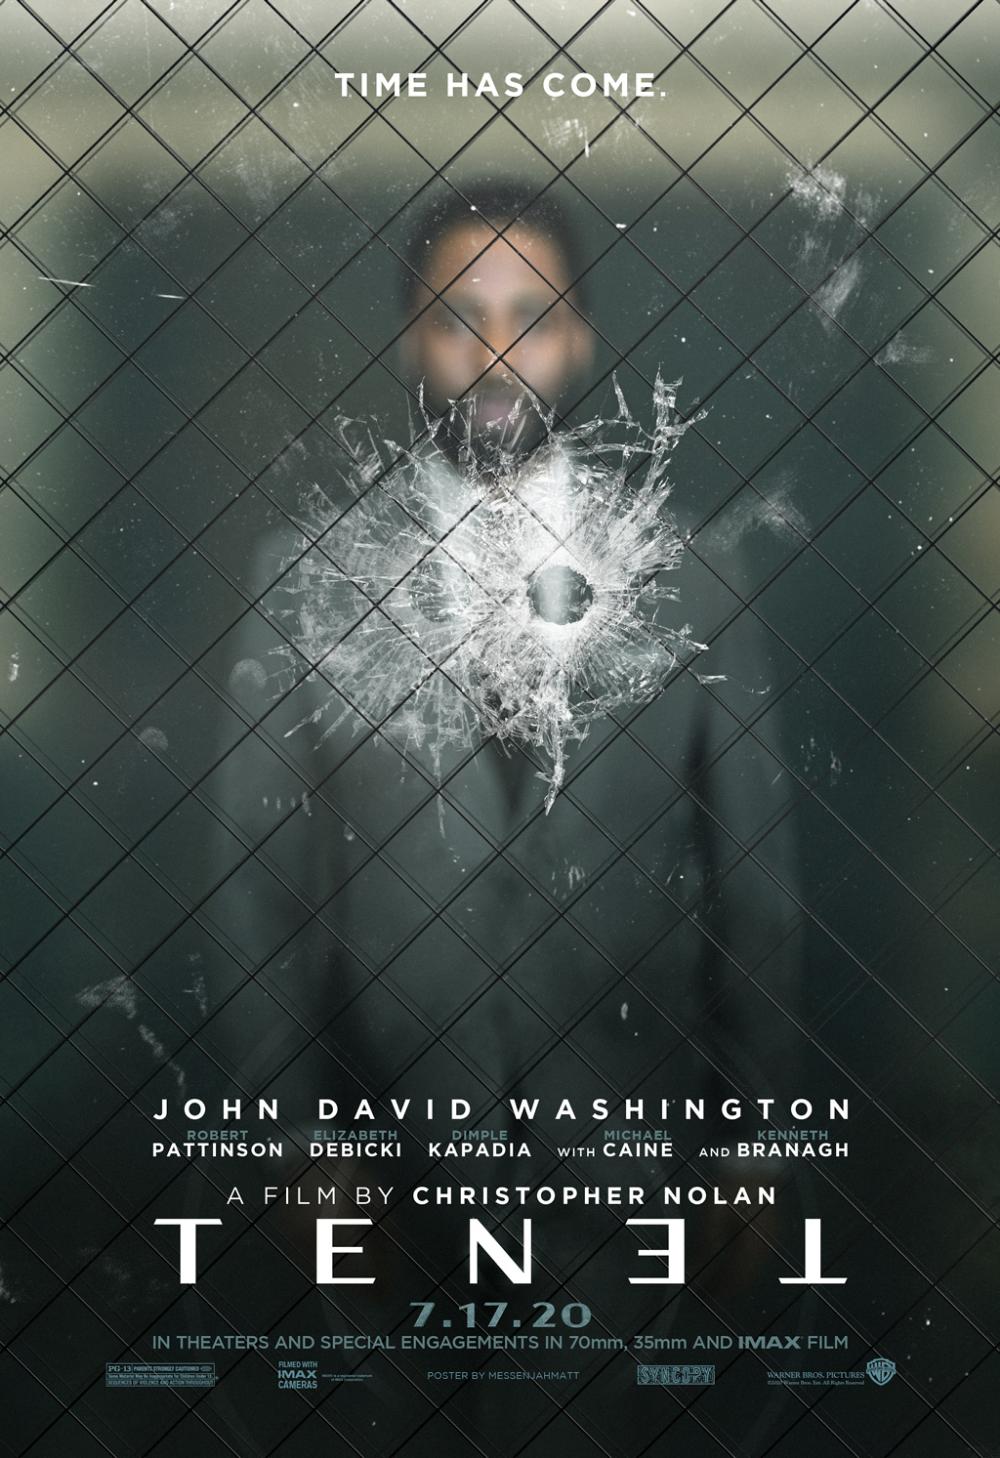 Tenet Poster Action Movie Poster James Bond Movie Posters Space Movie Posters